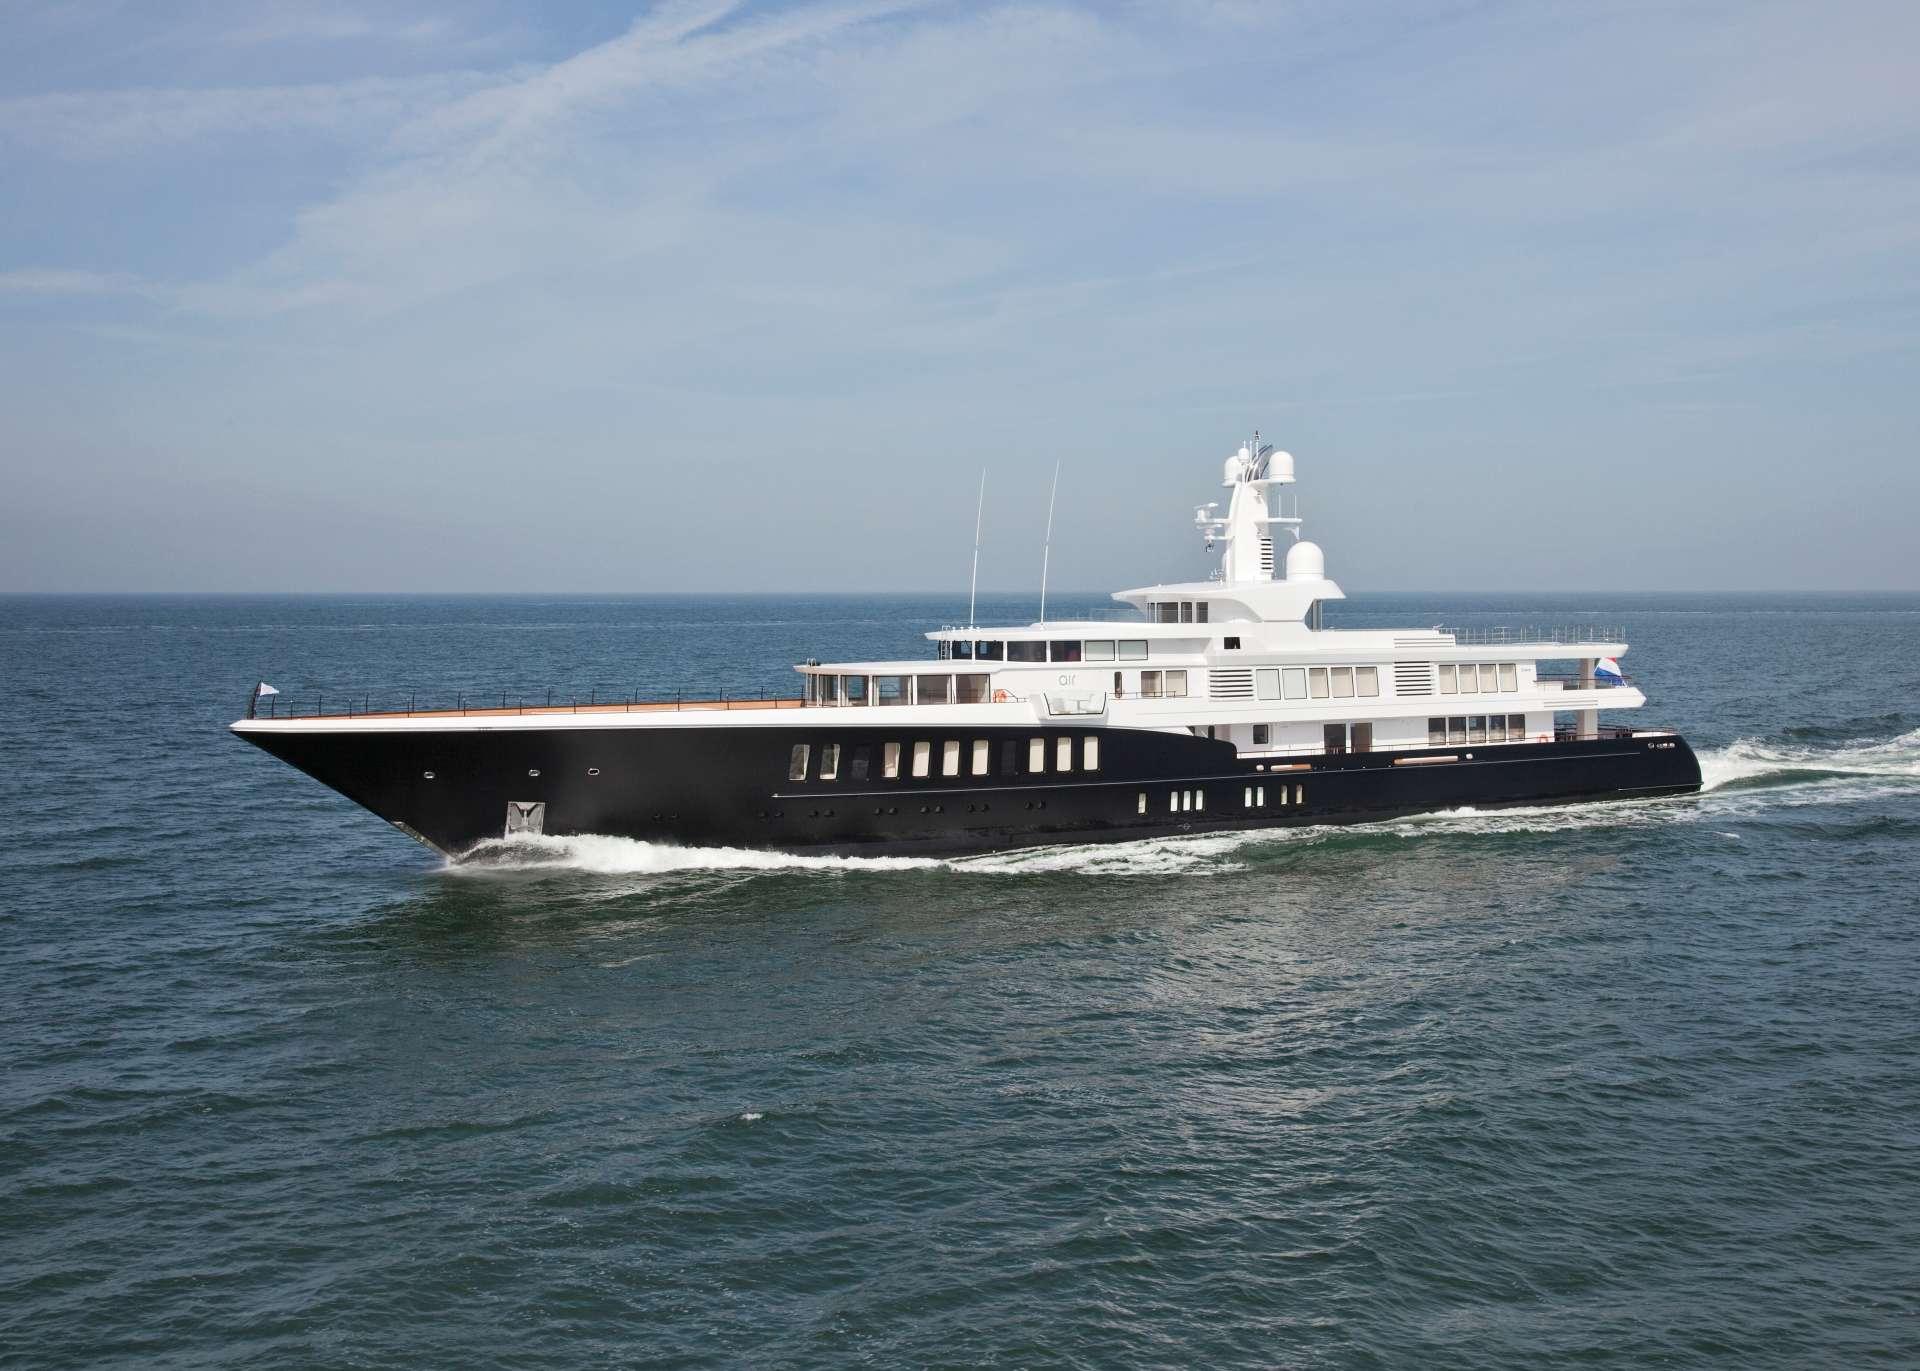 Air Feadship Royal Dutch Shipyards